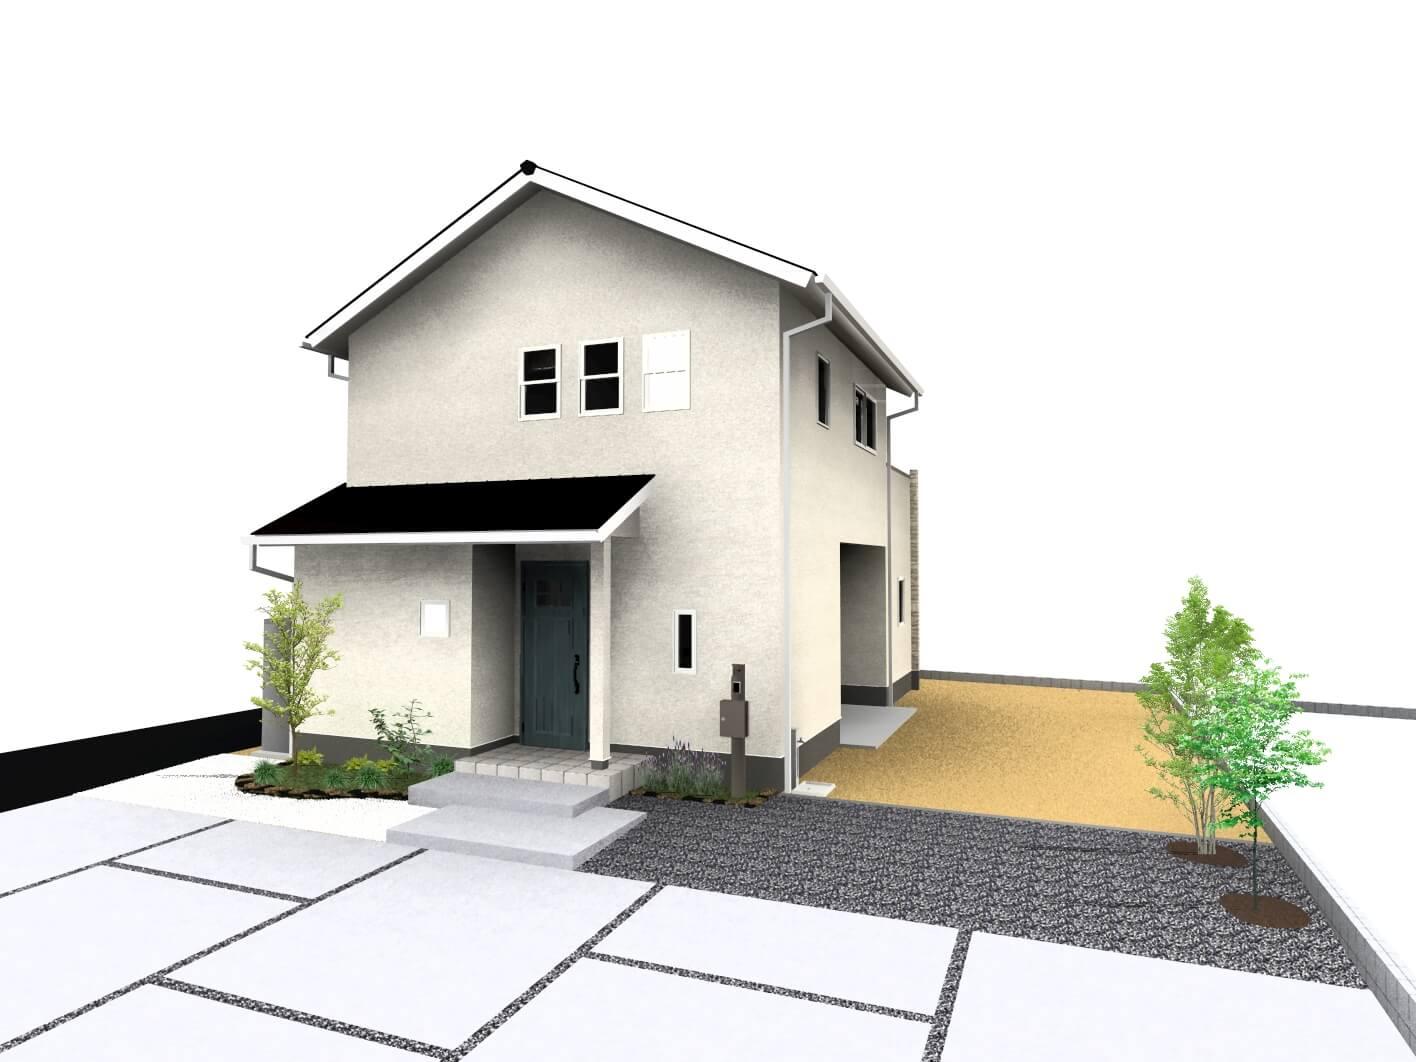 白石町東郷新築住宅「OURS白石東郷1号地」「大人可愛い2階建て住宅」◆外観イメージ